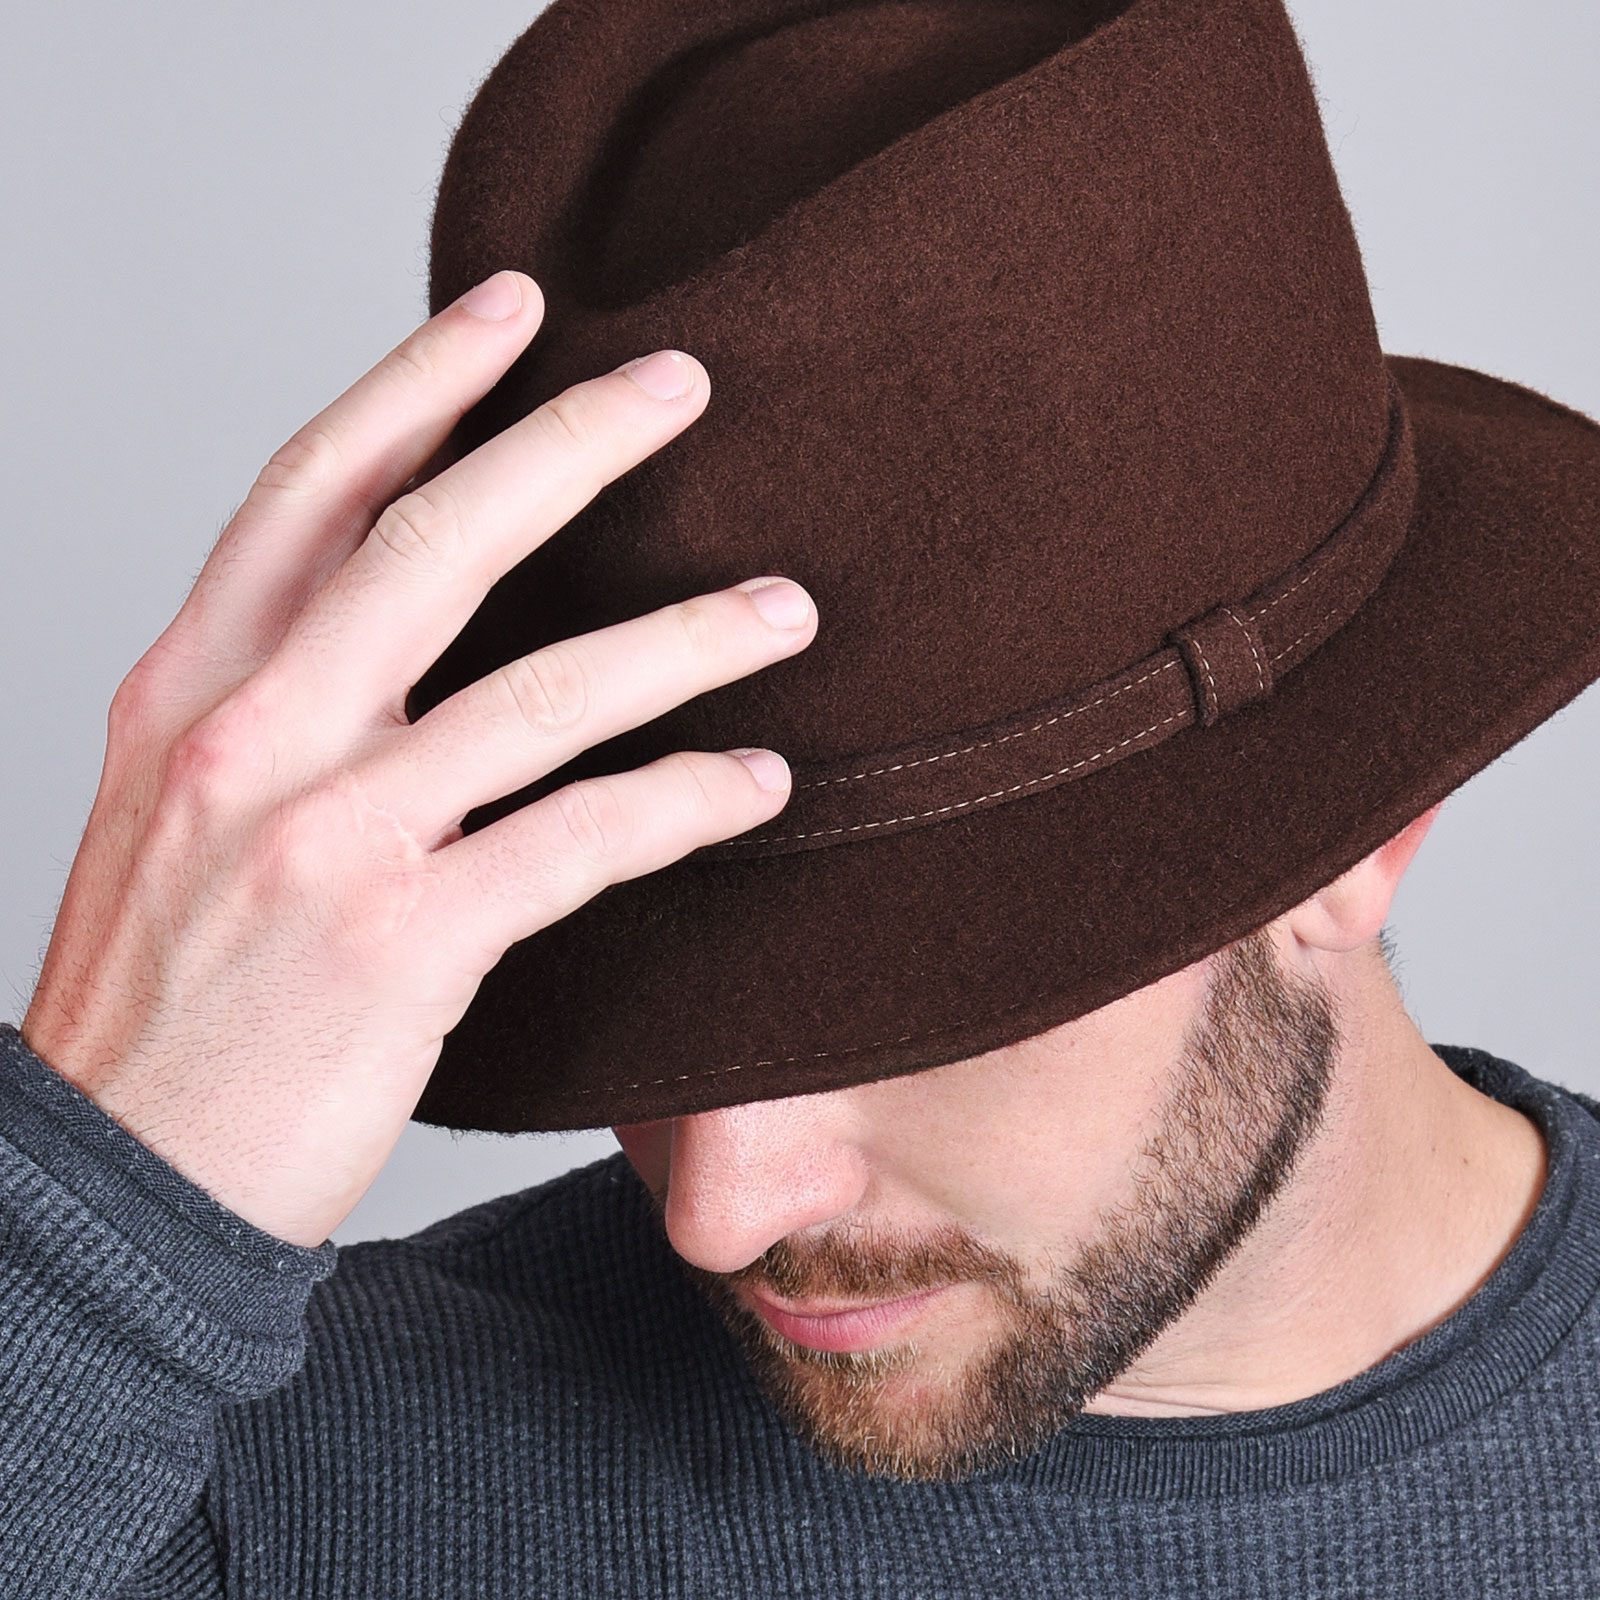 http://lookbook.allee-du-foulard.fr/wp-content/uploads/2018/11/CP-01016-VH16-2-borsalino-homme-marron-feutre-laine-1600x1600.jpg